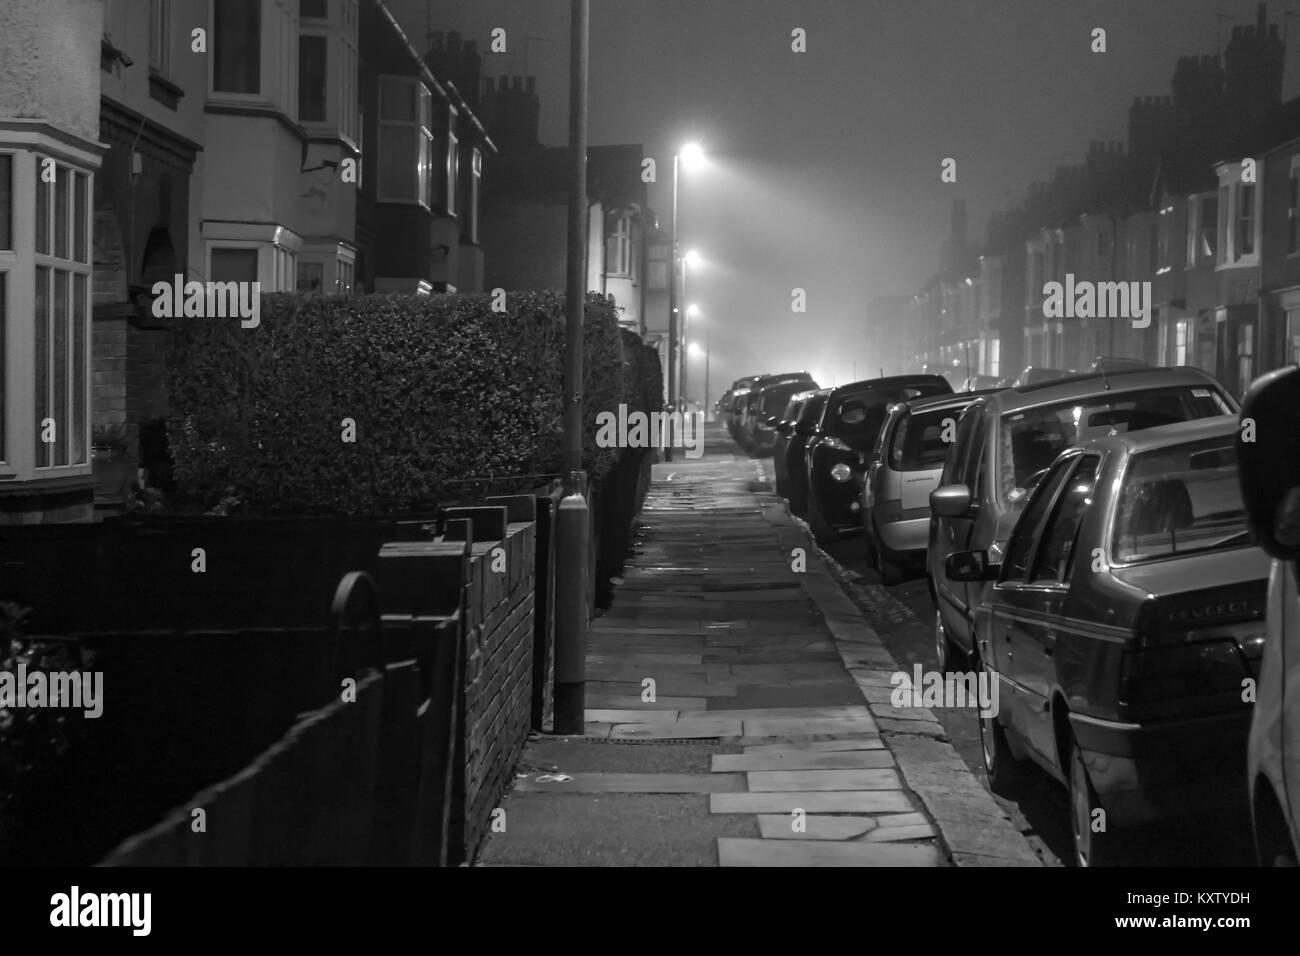 Street scene early evening in winter, Abington area, Northampton, U.K. - Stock Image